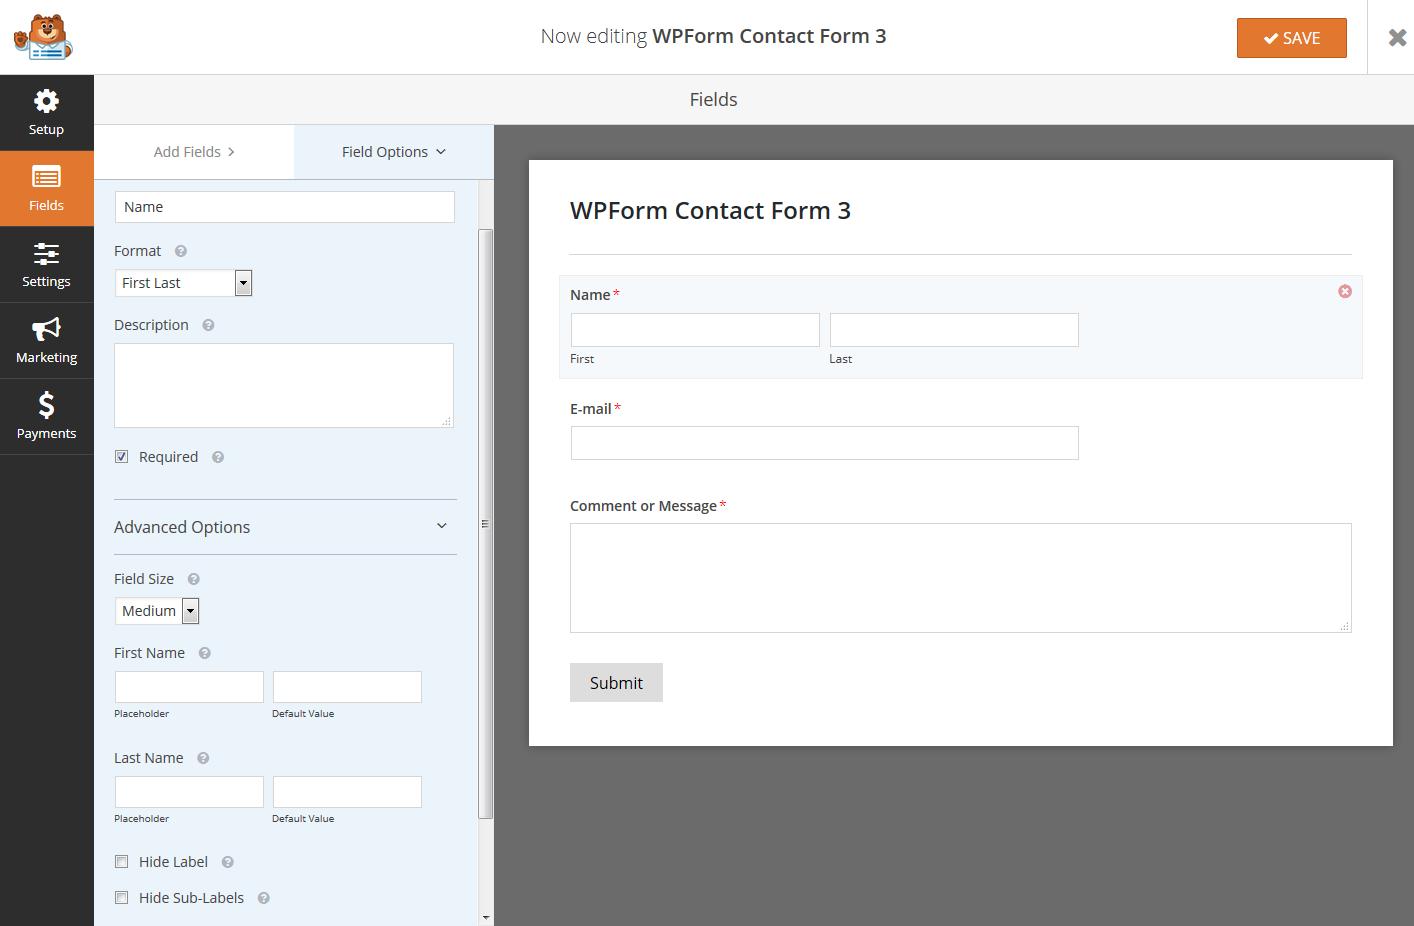 WPForm Field Options